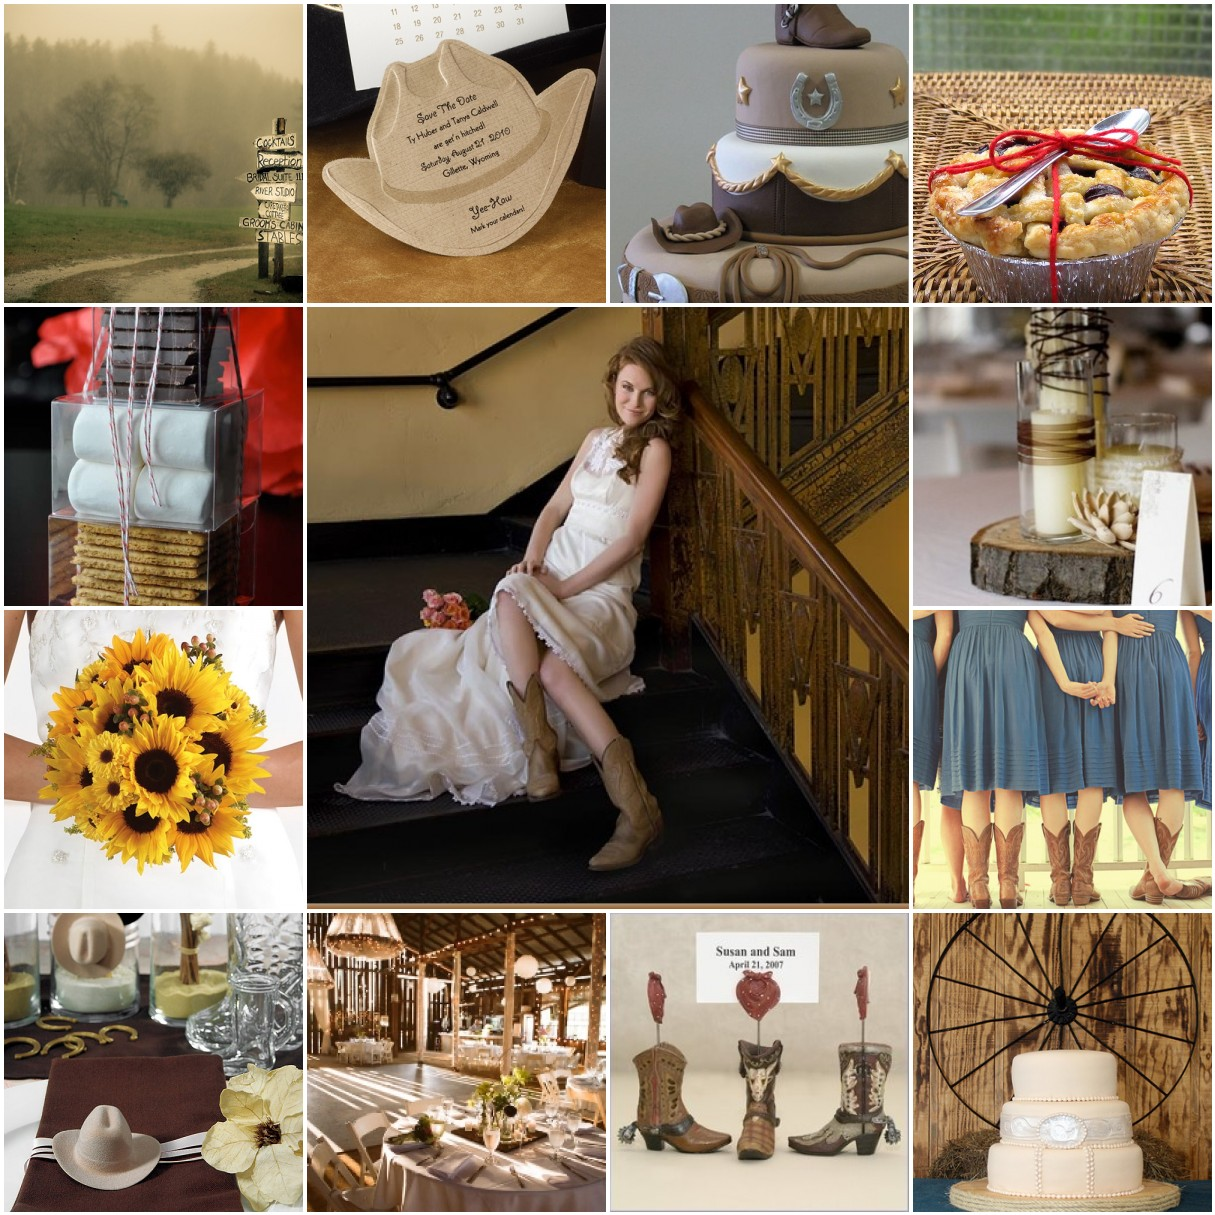 western wedding ideas western wedding ideas Western Wedding Reception doing